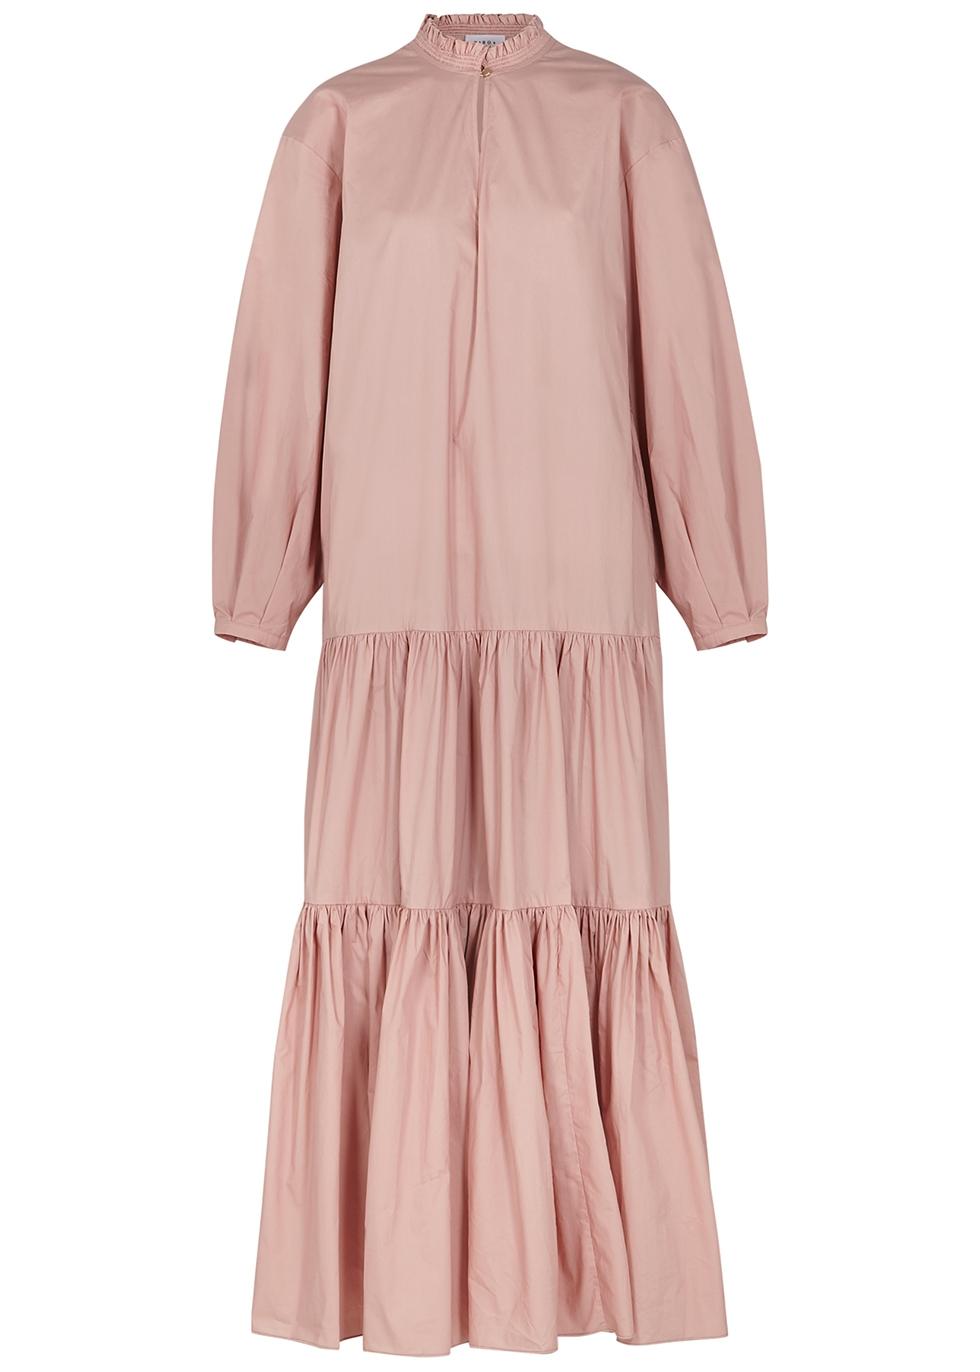 Carlotta light pink tiered cotton maxi dress